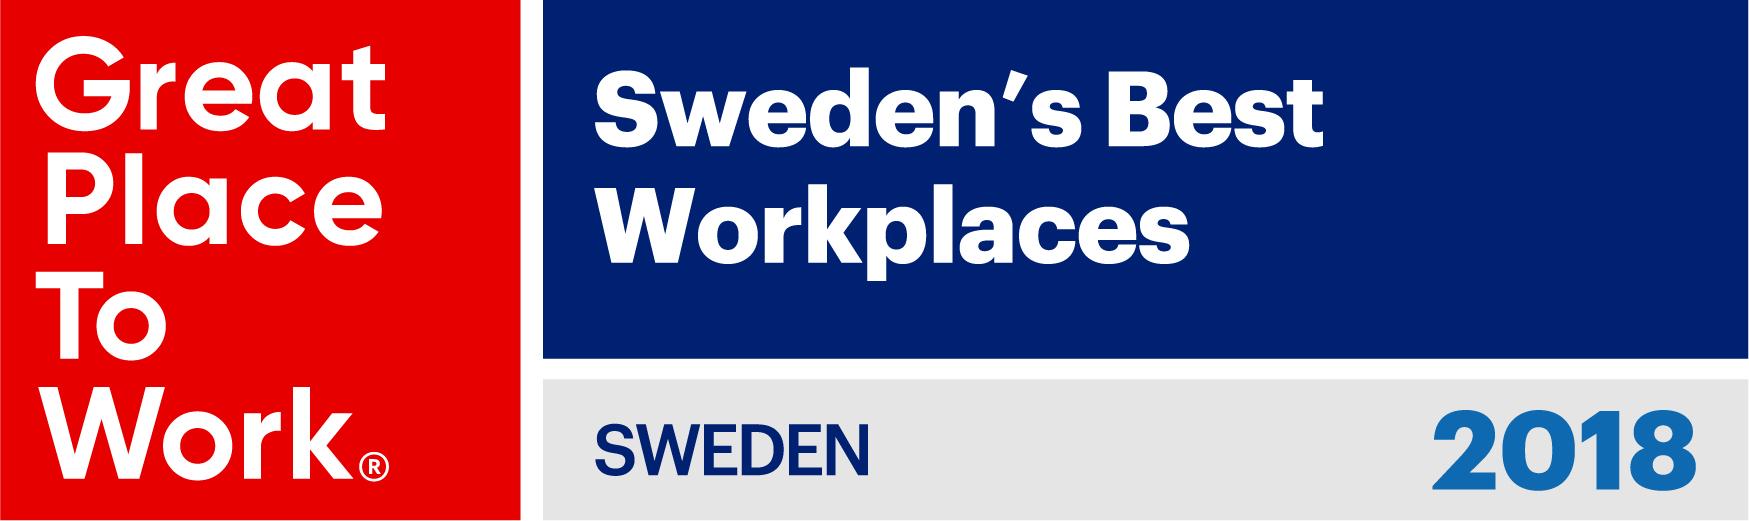 SBA2018_Sweden_RGB_ENG